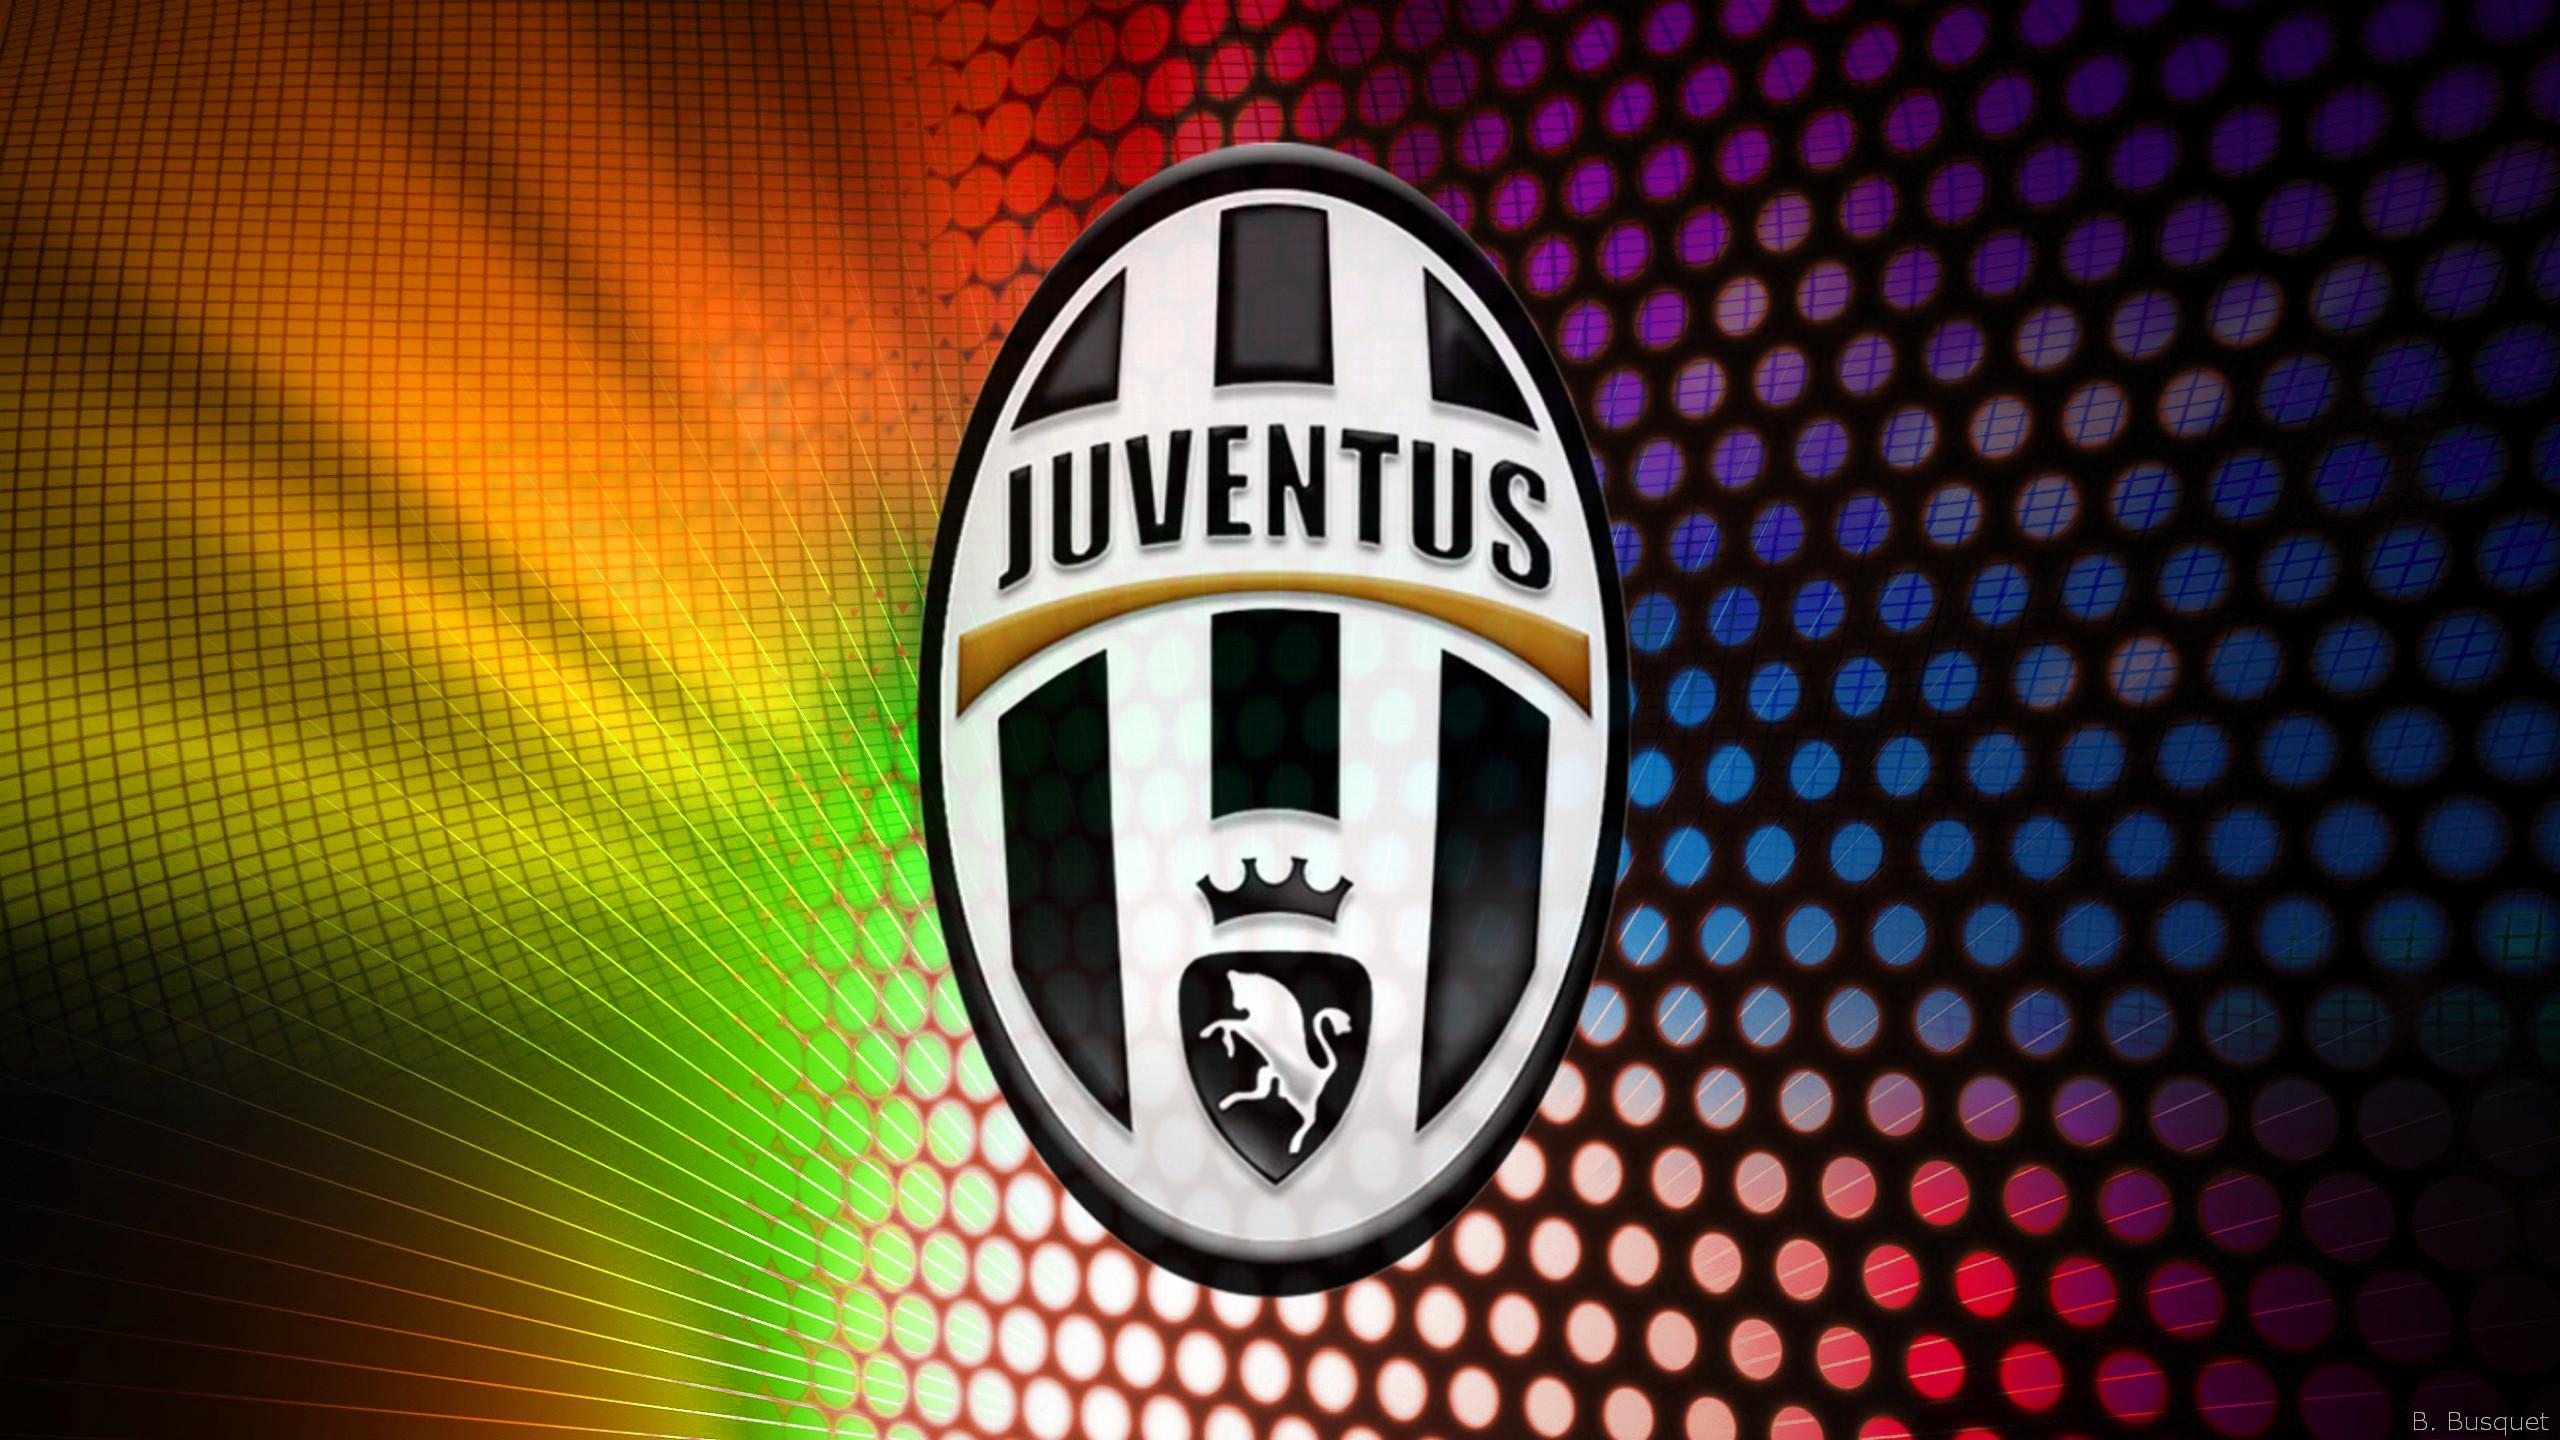 Free Download Image Gallery Juventus Fc Logo 2560x1440 For Your Desktop Mobile Tablet Explore 77 Juventus Wallpaper Juventus Logo Wallpaper Juventus Wallpaper For Computer